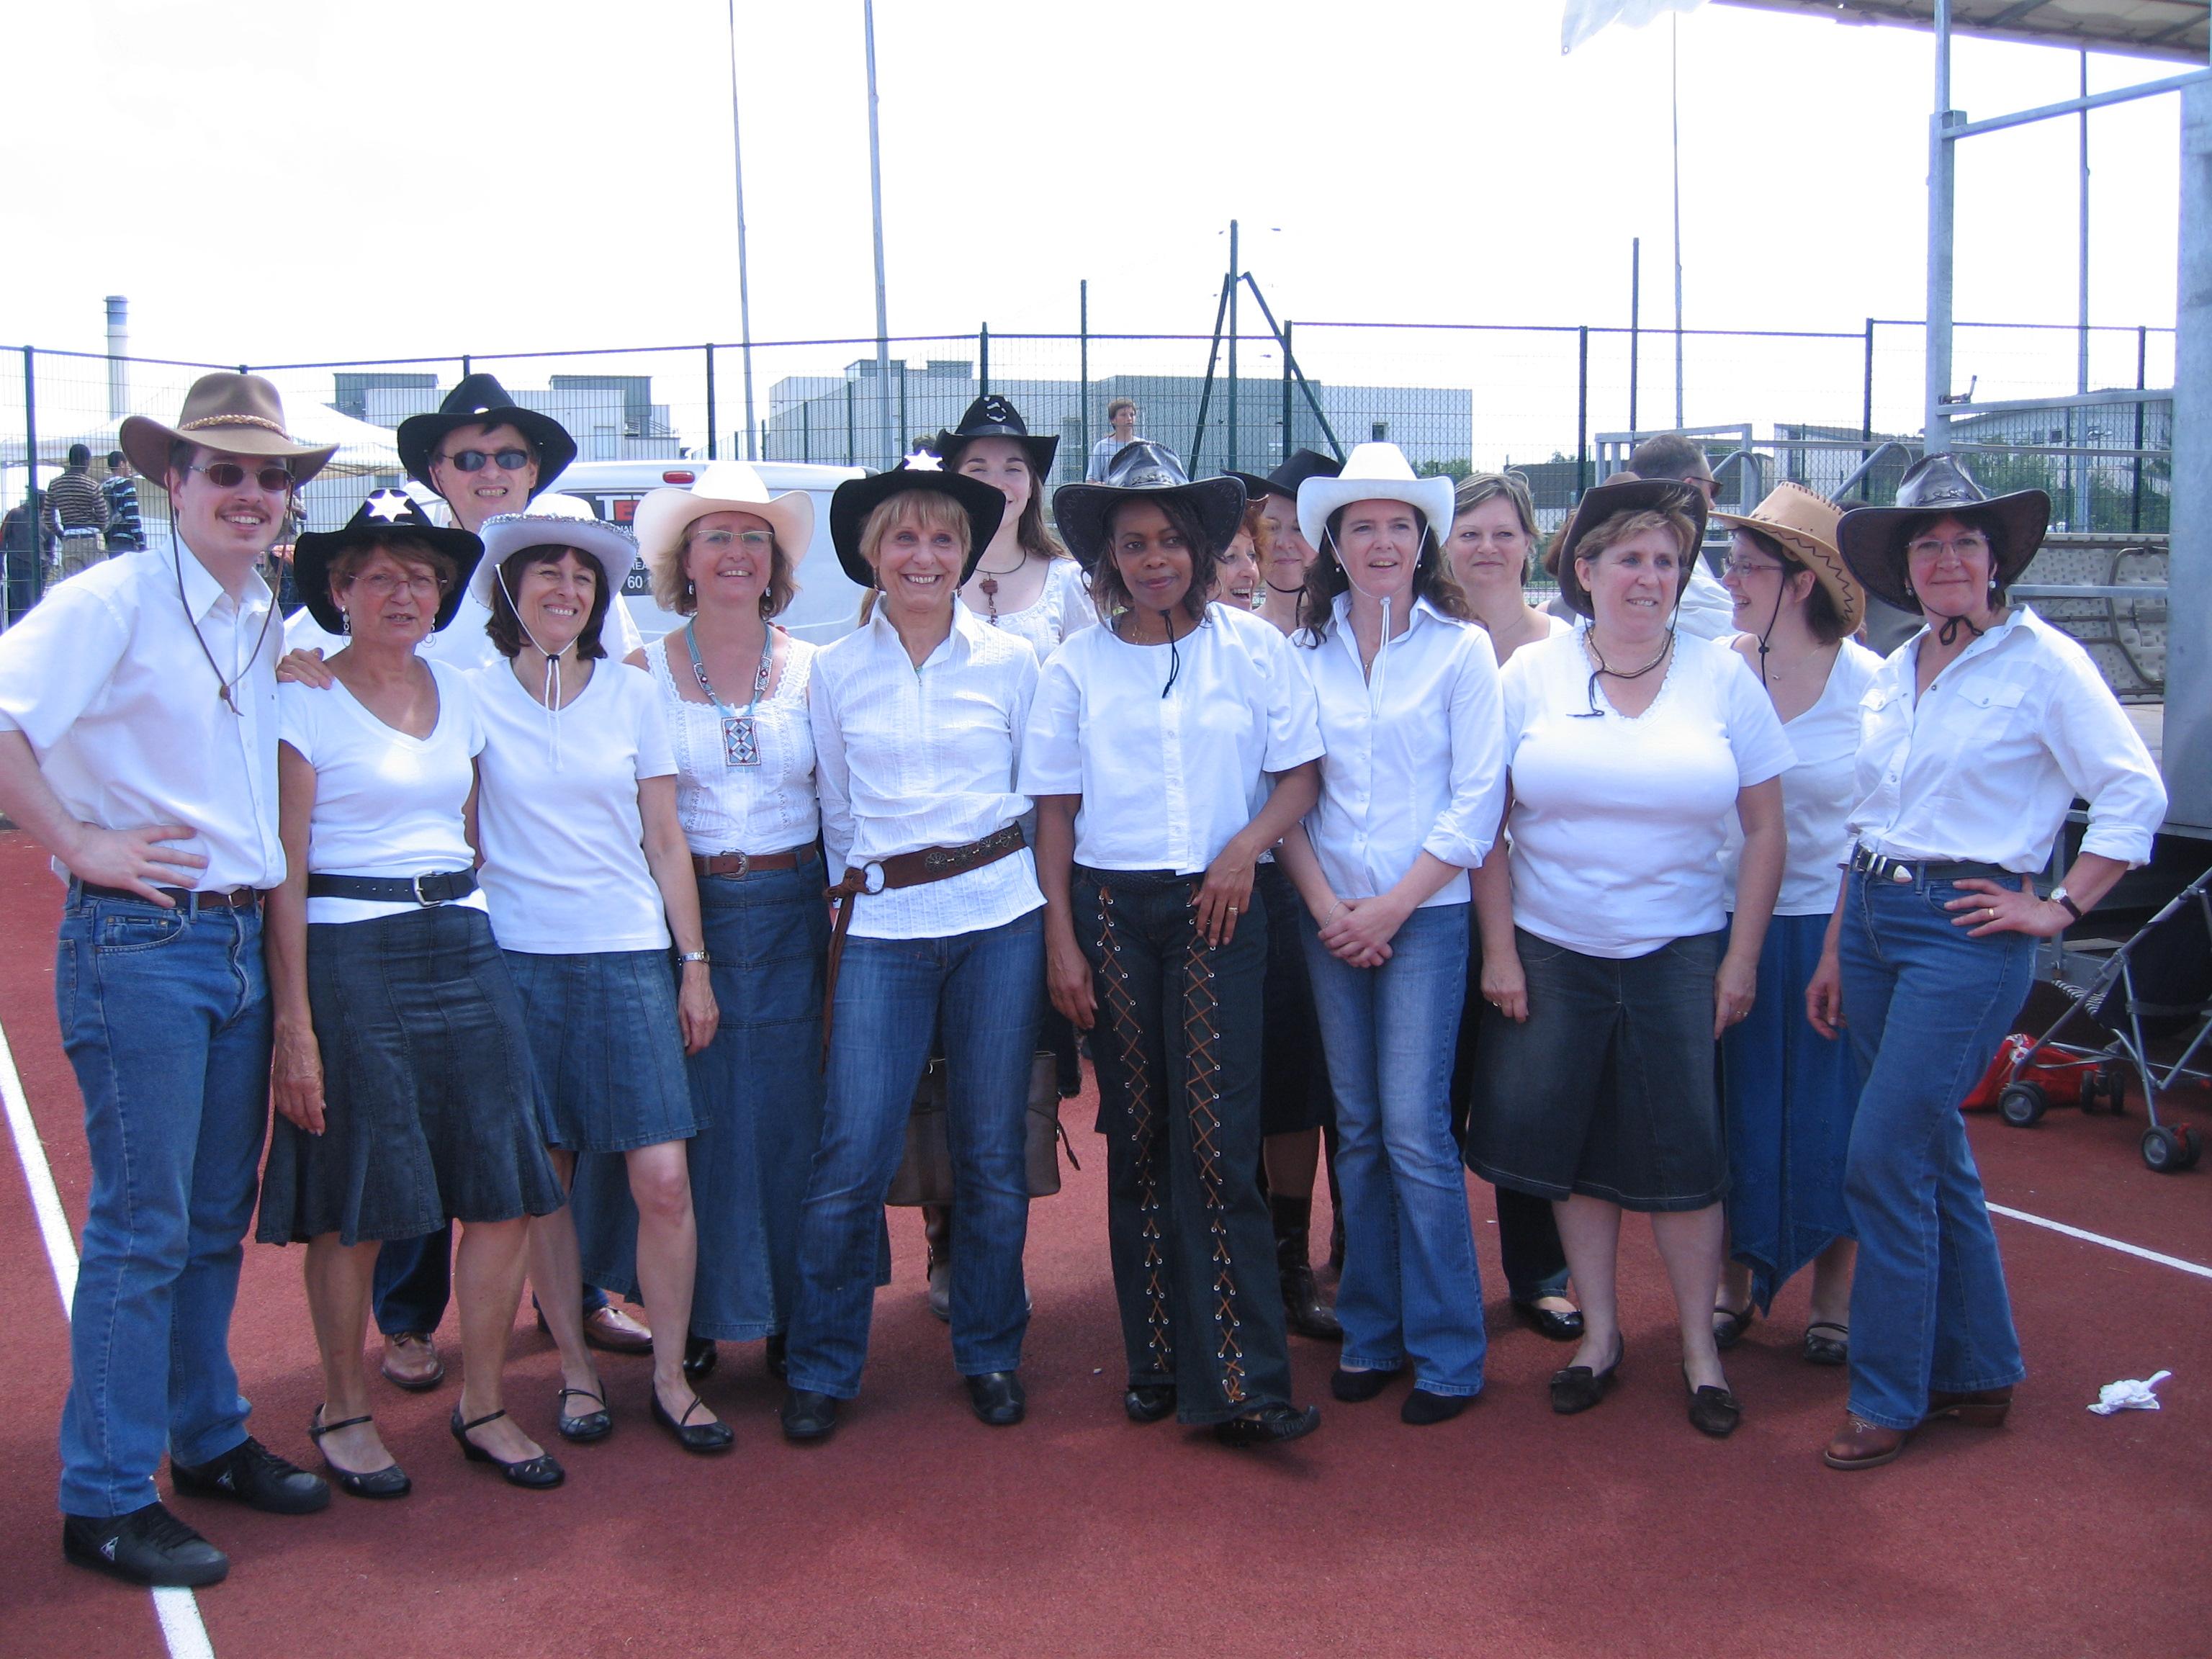 country-fete-sport-2008.jpg